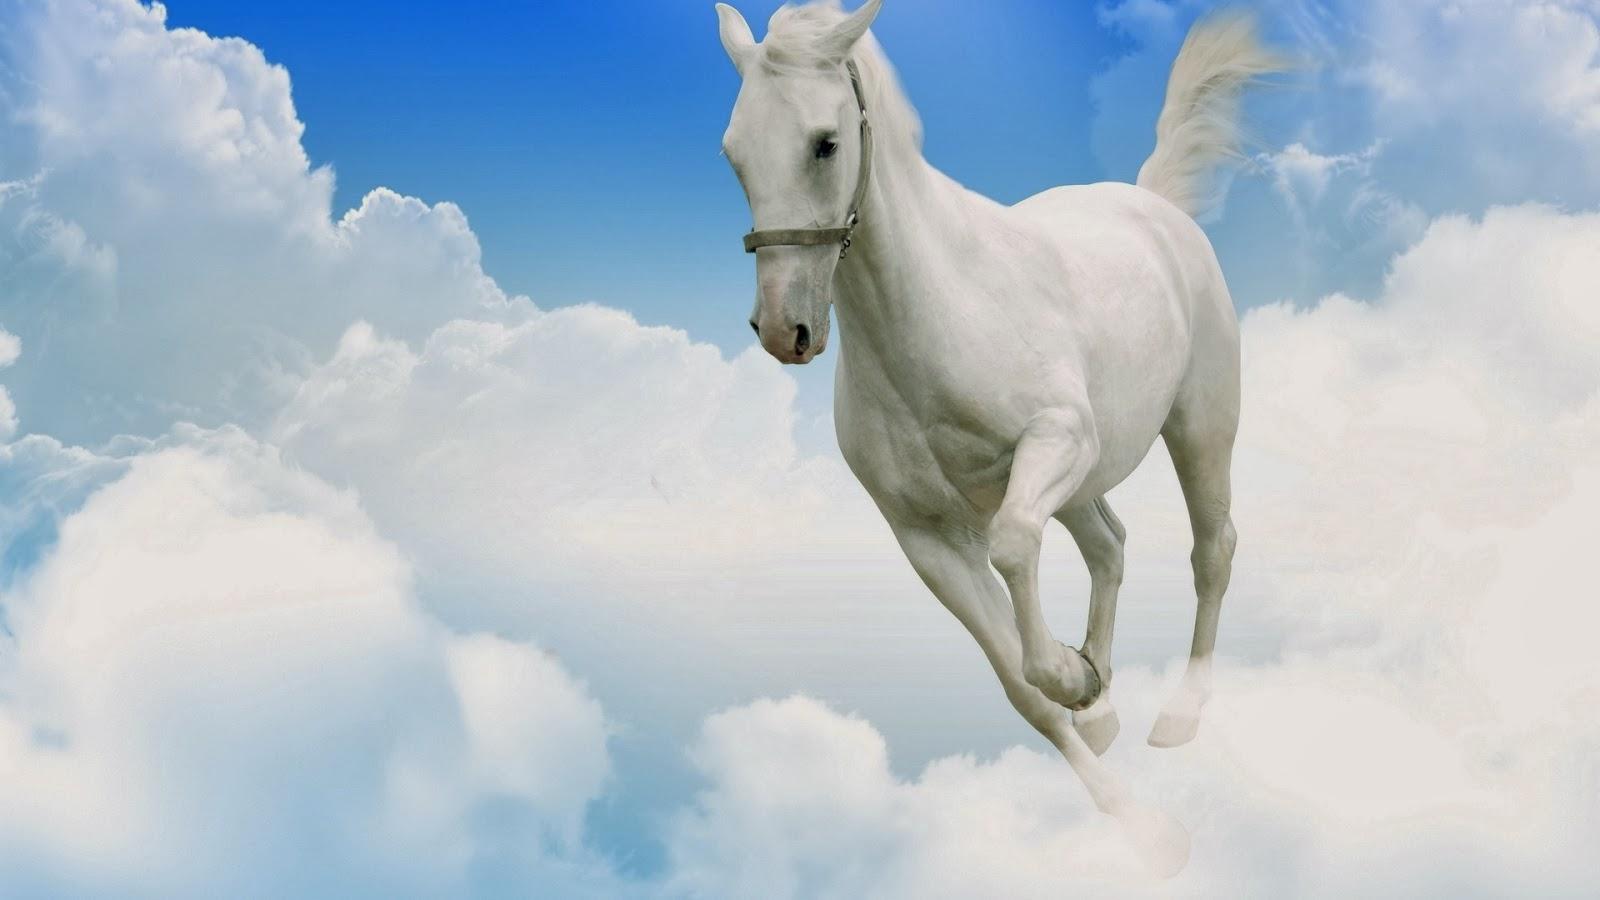 White Horse Wallpaper For Desktop Wallpapersafari